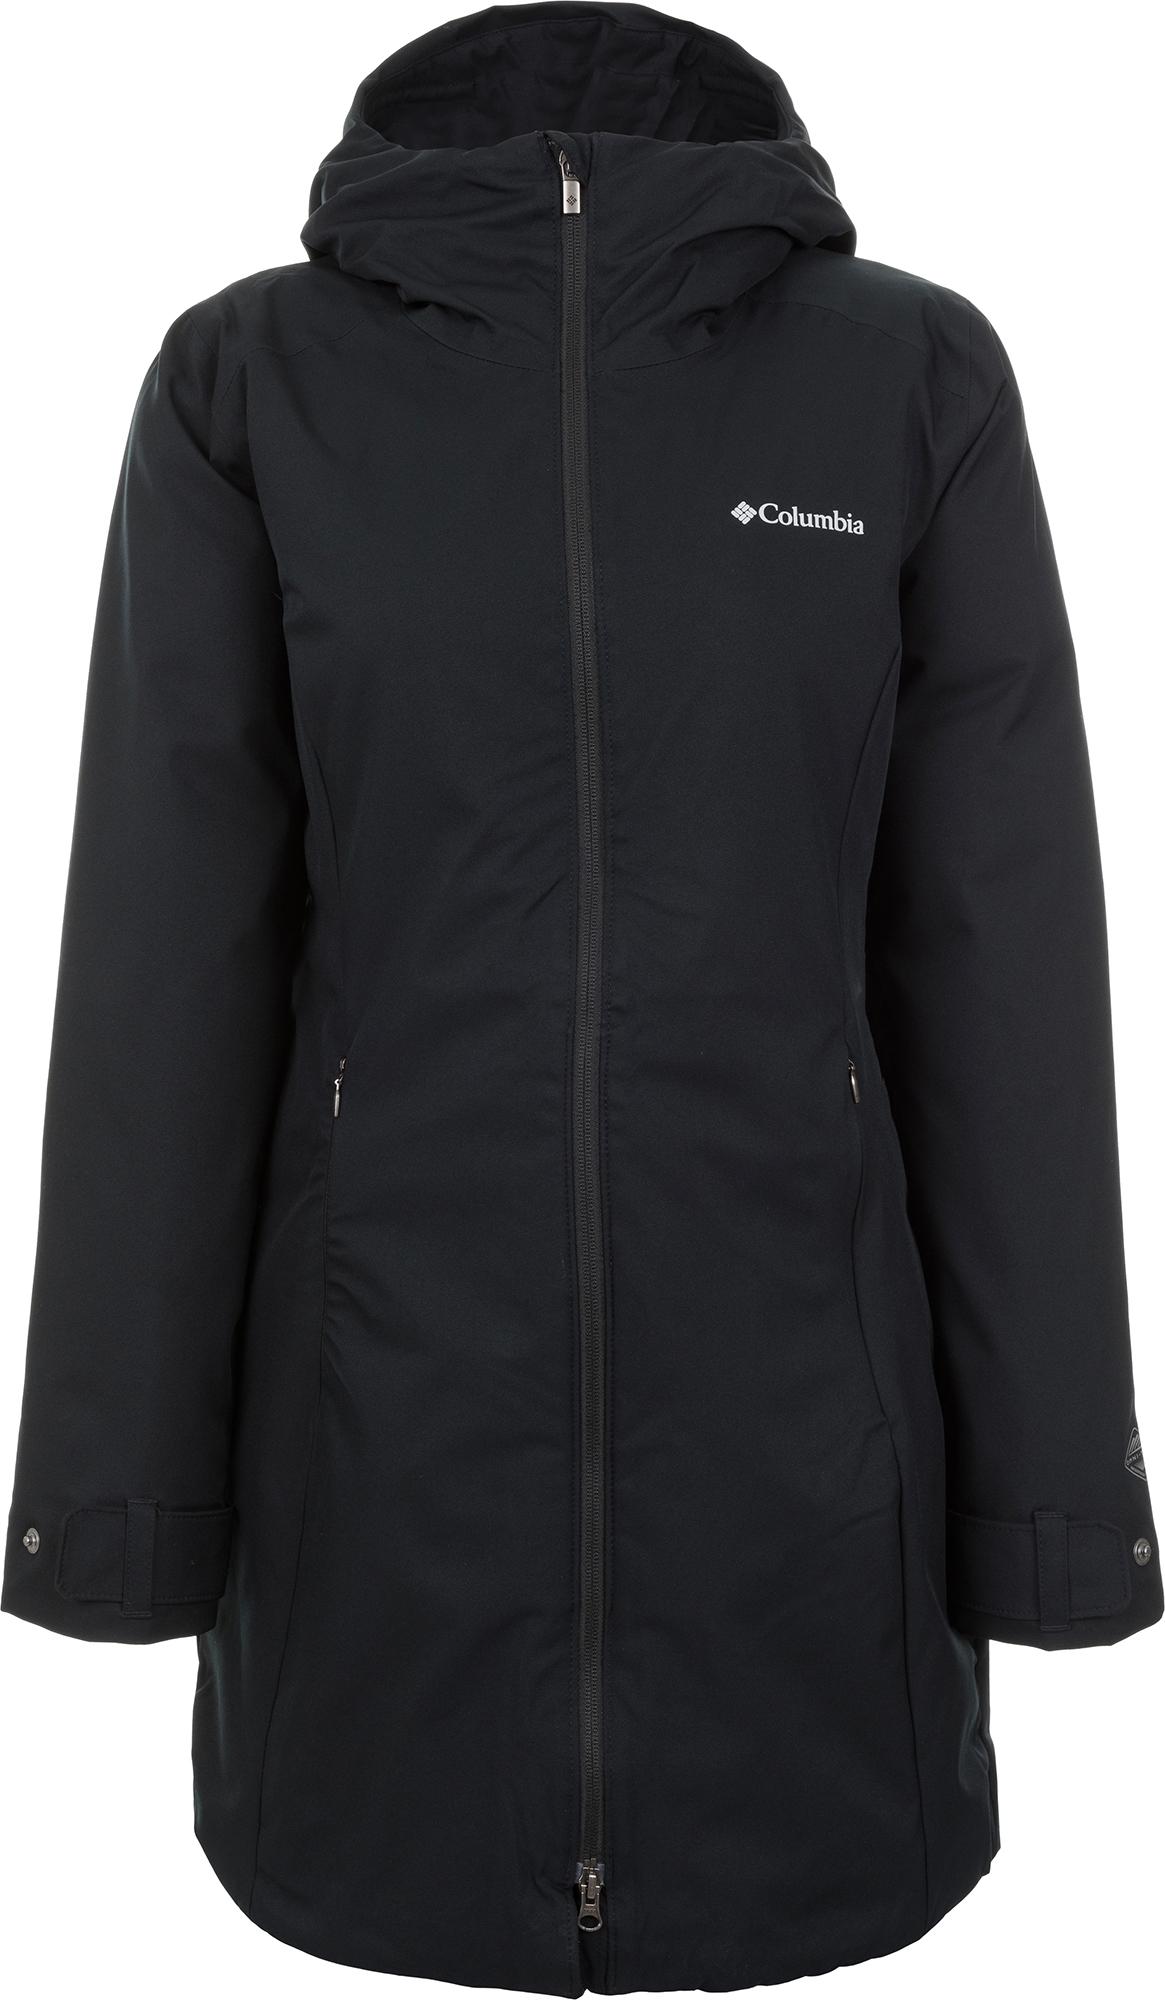 Columbia Куртка утепленная женская Columbia Autumn Rise, размер 50 columbia куртка утепленная женская columbia windgates размер 50